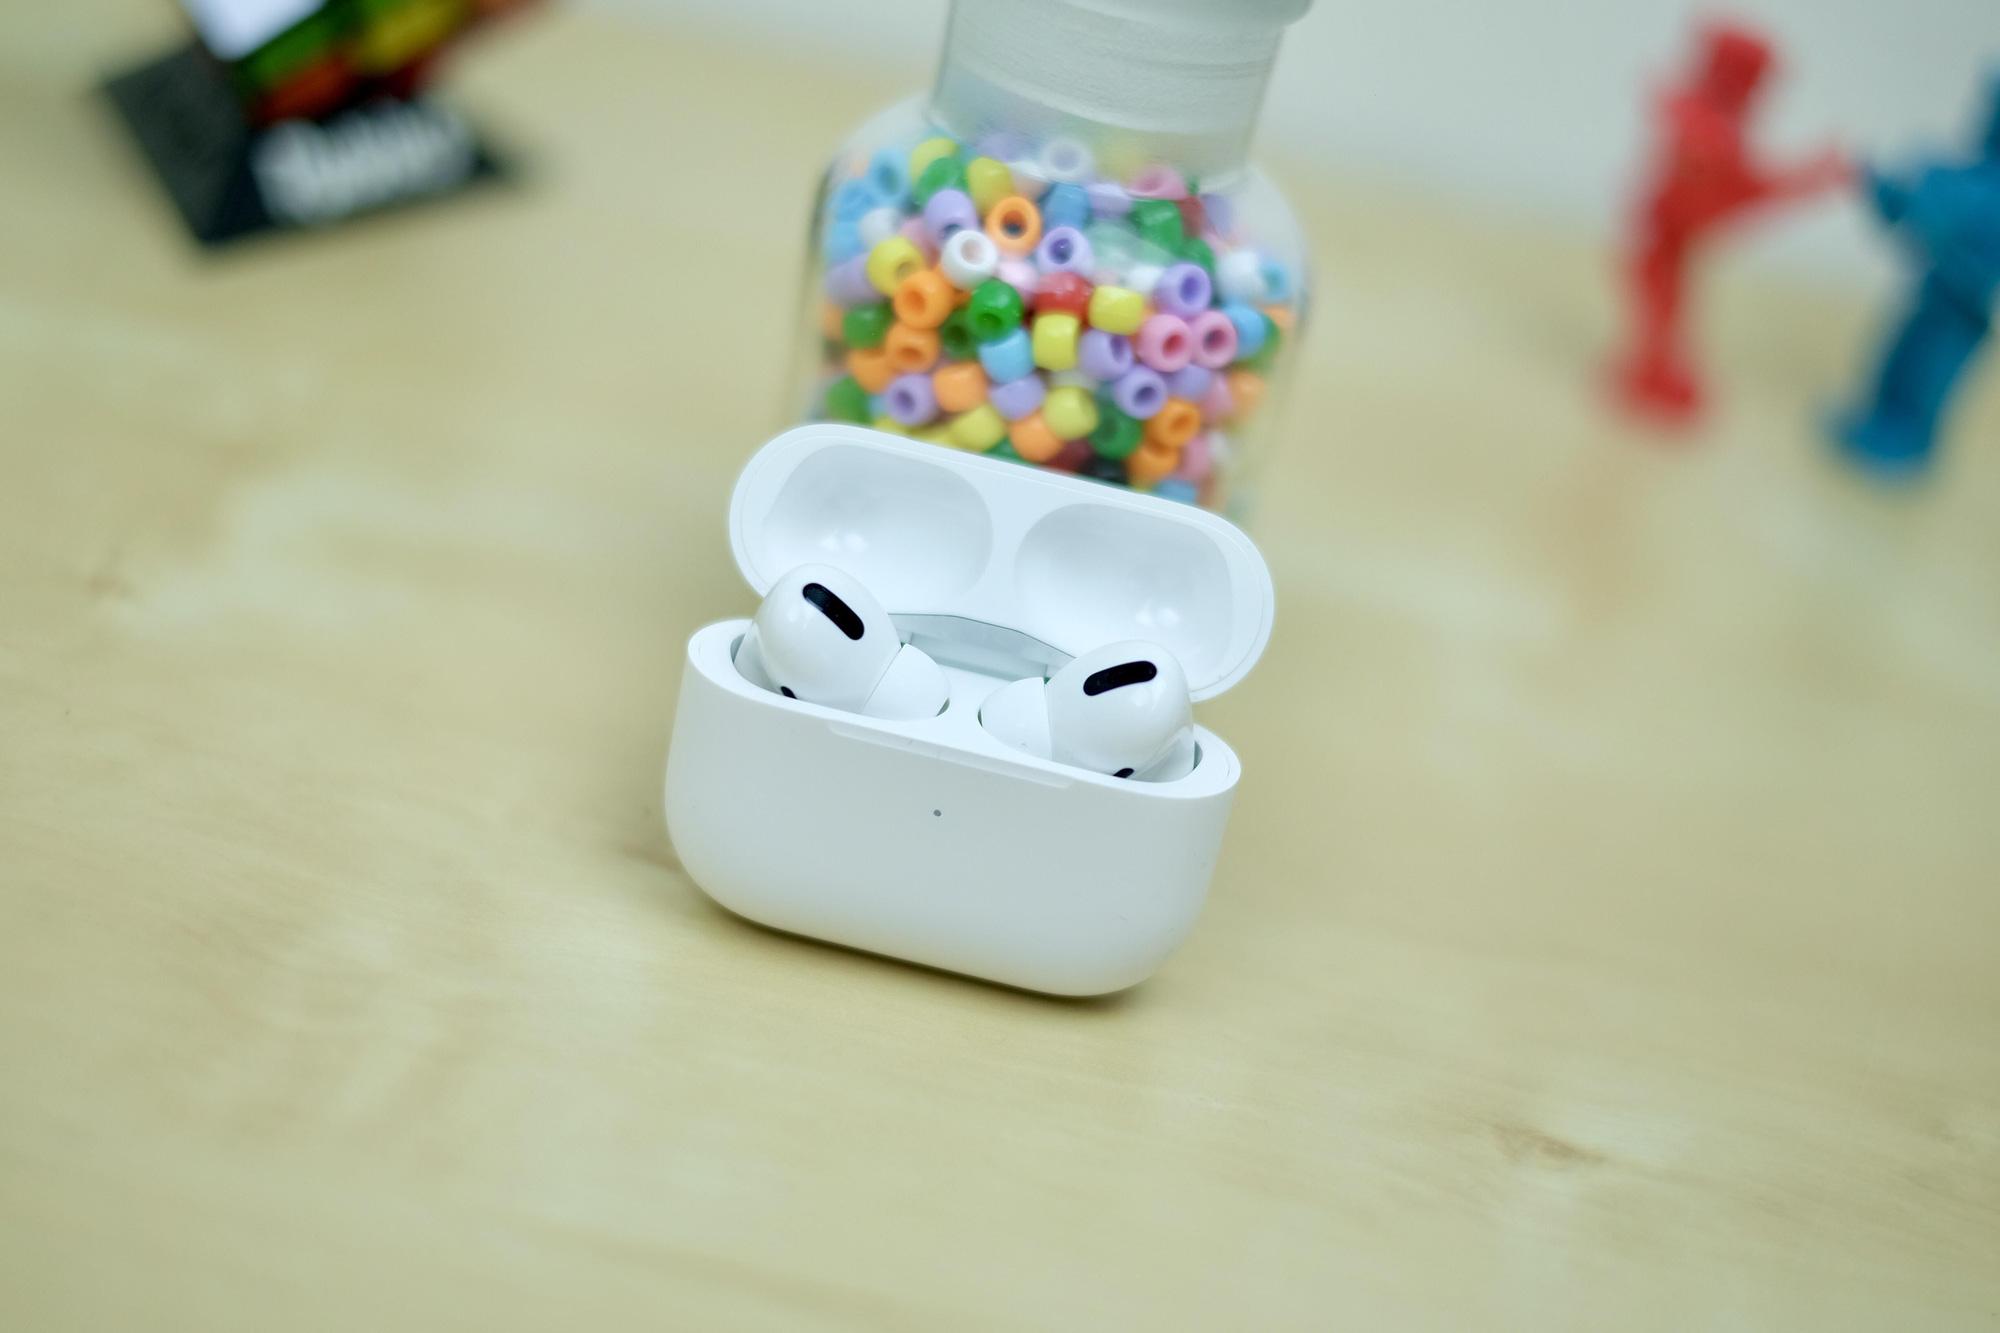 Tat-tan-tat-nhung-thu-ban-can-biet-ve-tai-nghe-Bluetooth-AirPods-Pro-1